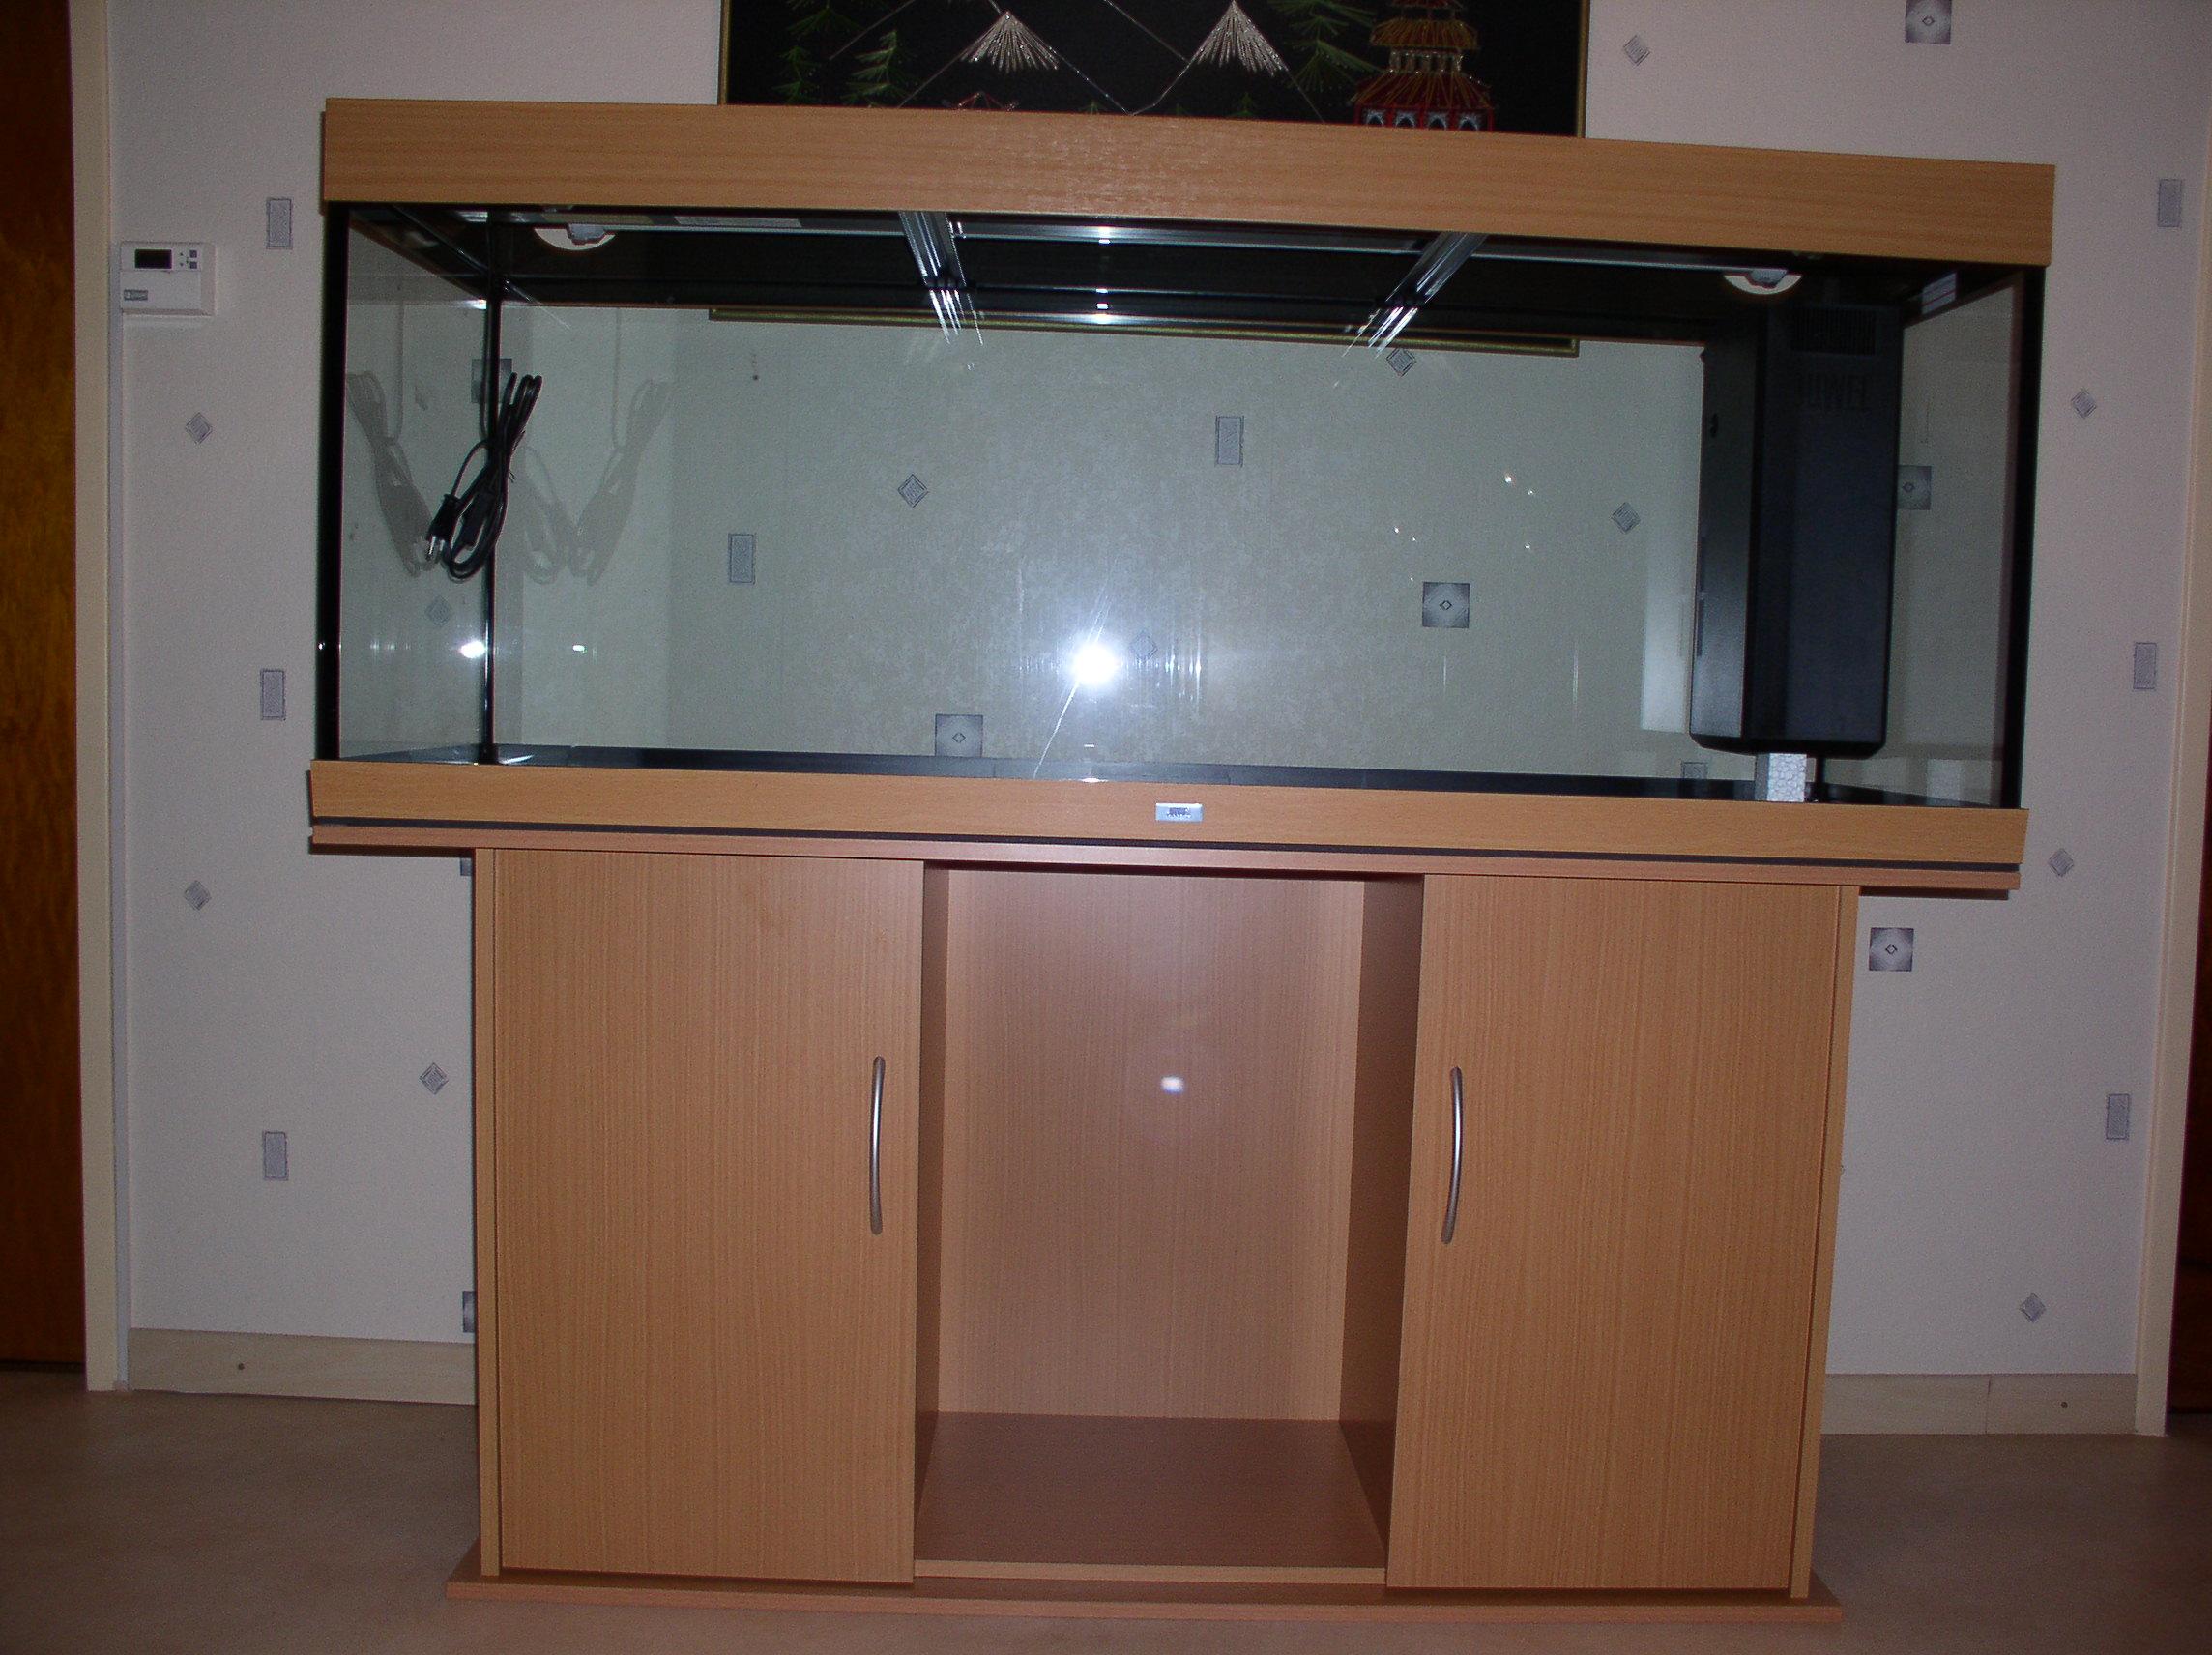 Aqua poissons galerie 1 - Aquarium 350 litres complet meuble et poissons ...